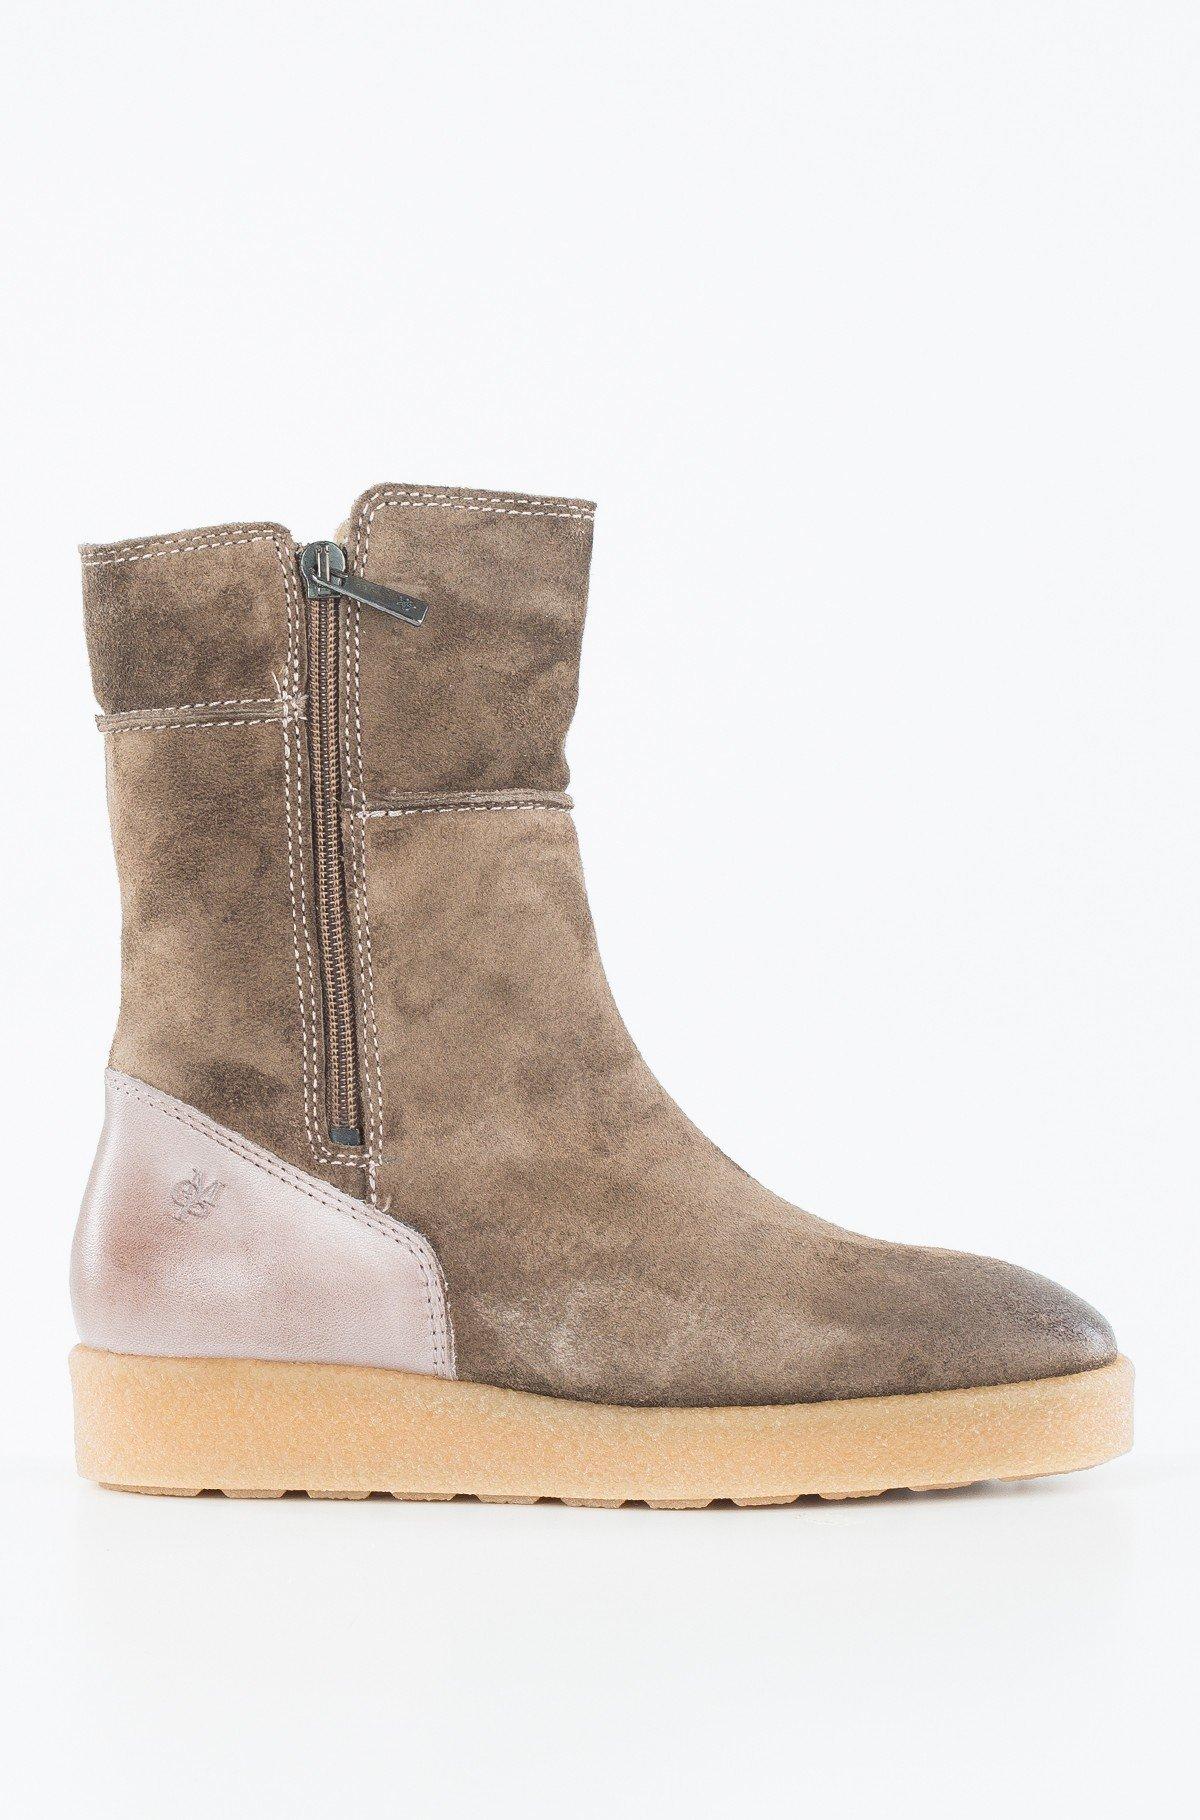 Boots 709 14296001 304-full-1